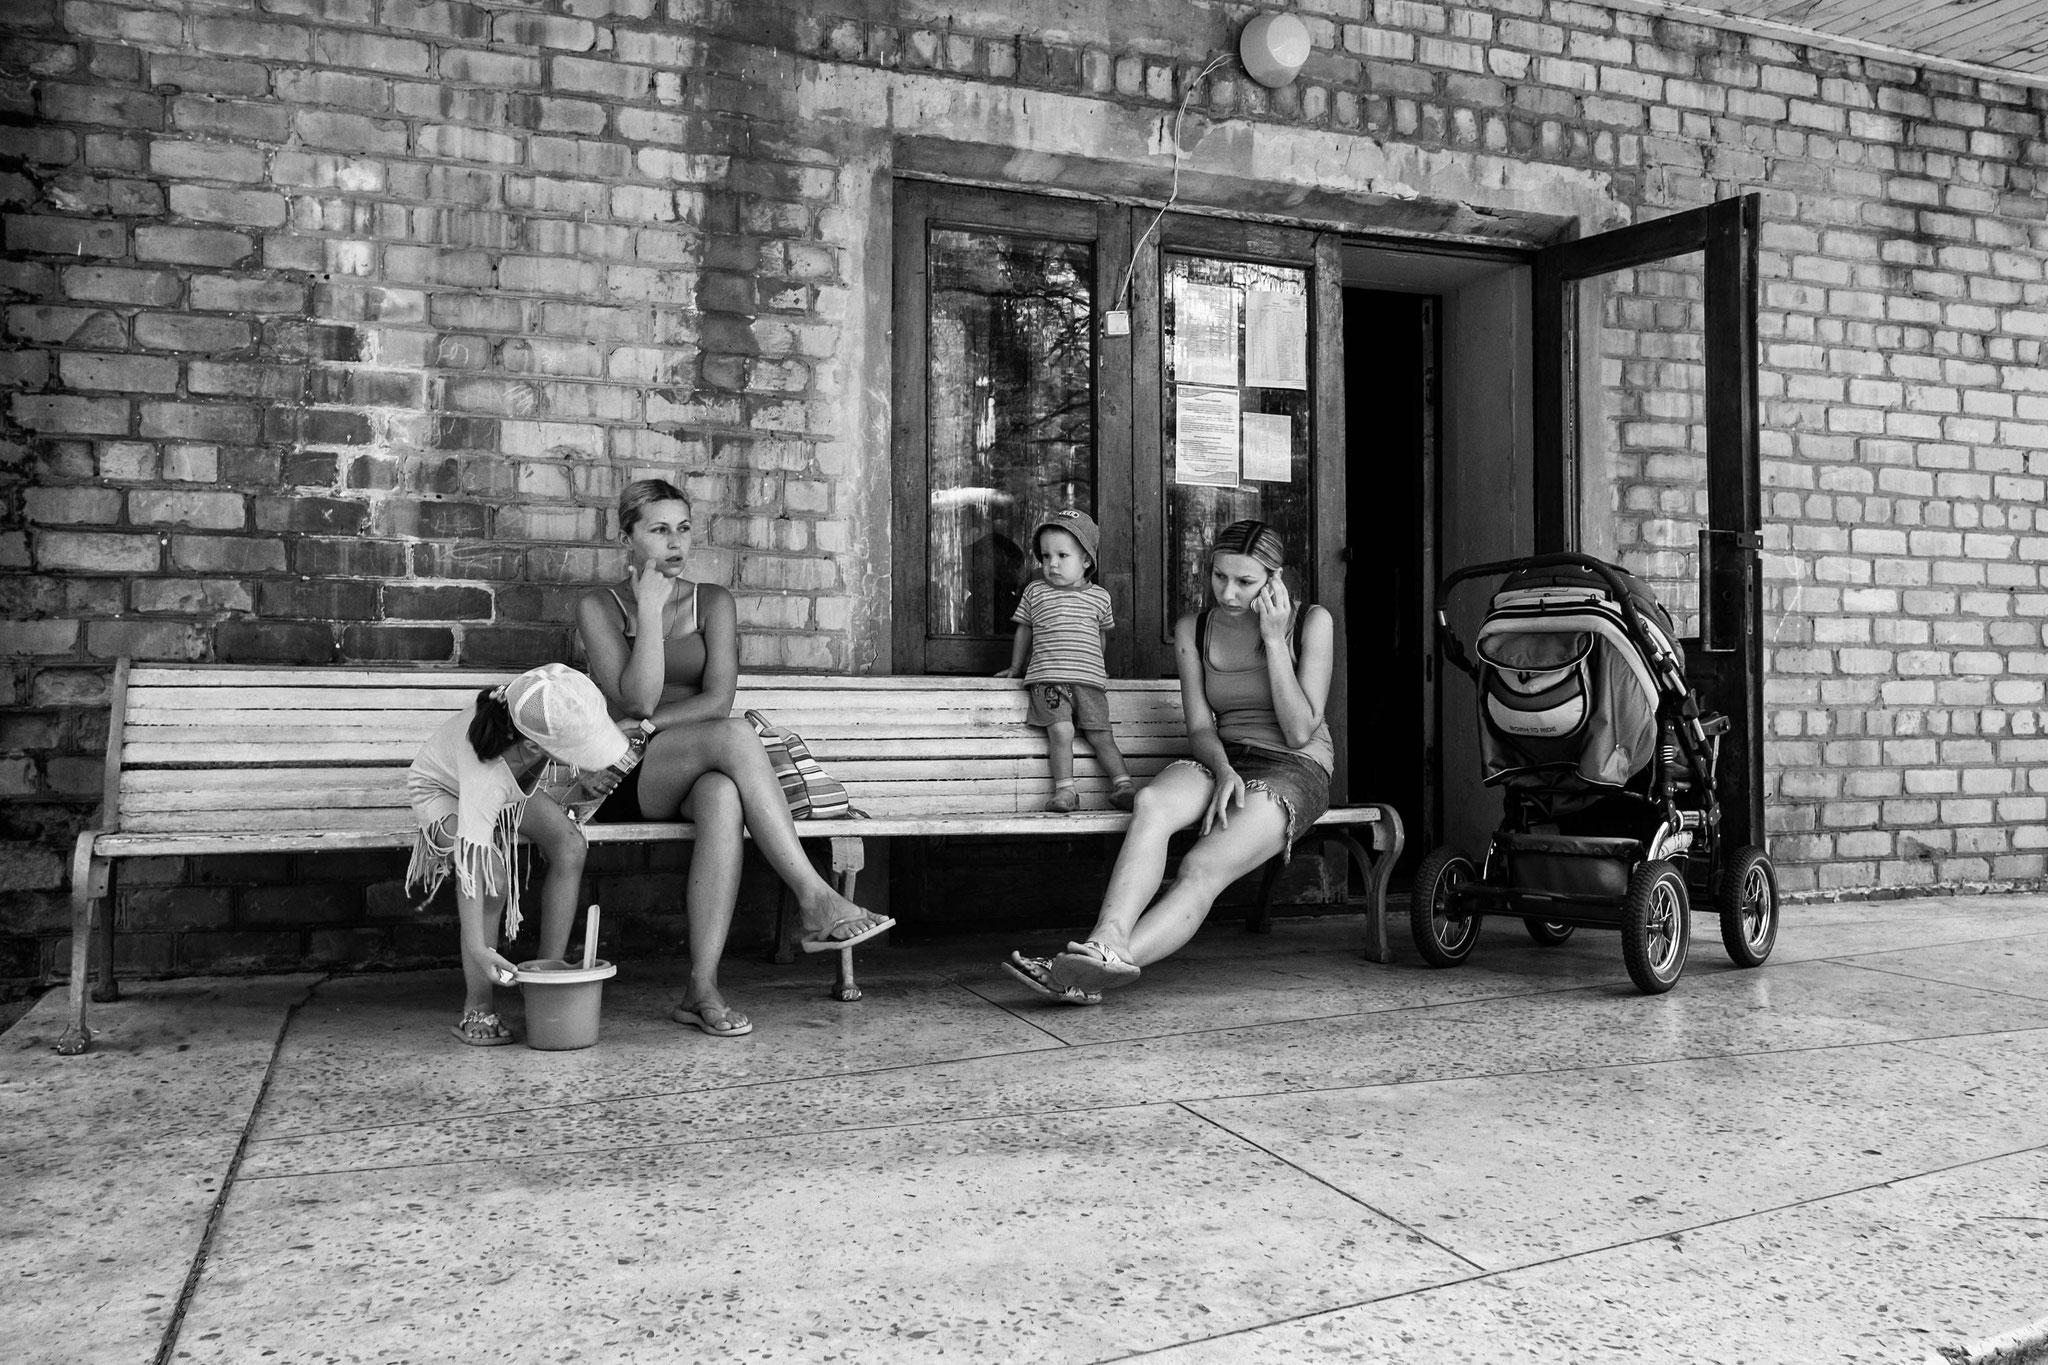 Collective house fpr IDPs, former Sanatory, Slovjansk/East Ukraine, 2016